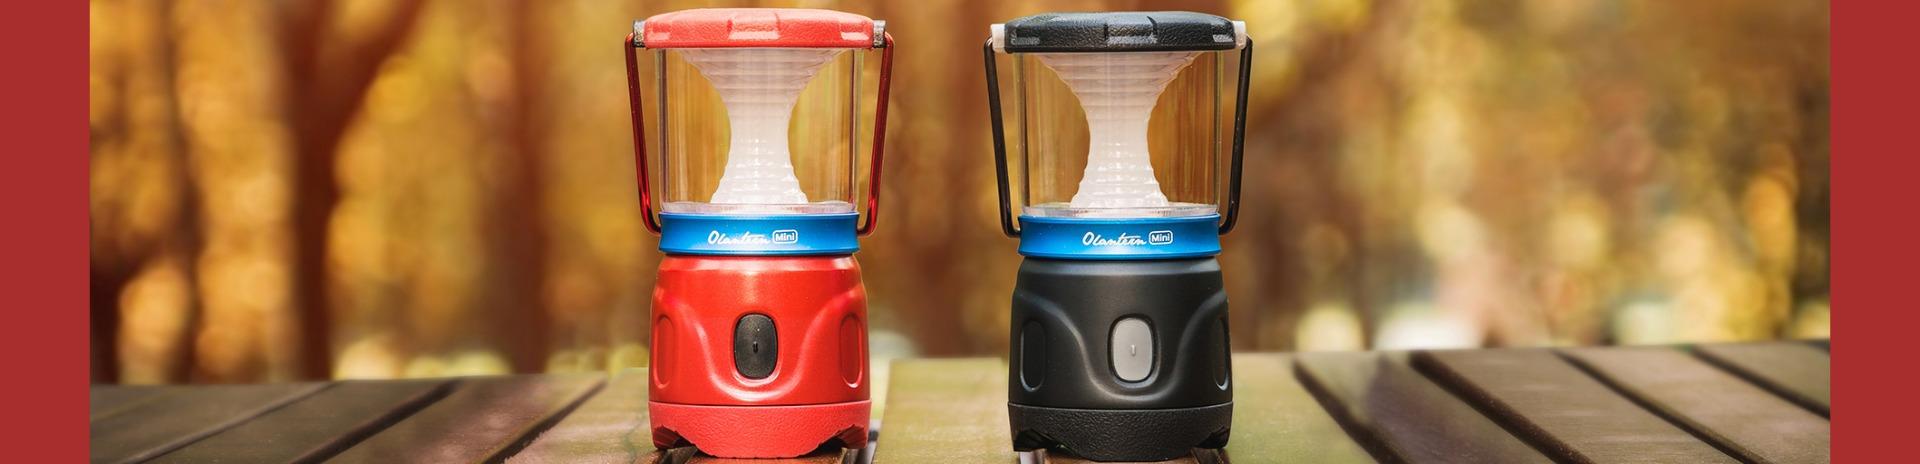 Olight New Product - Long-Awaited Versatile Olantern & Limited Colors